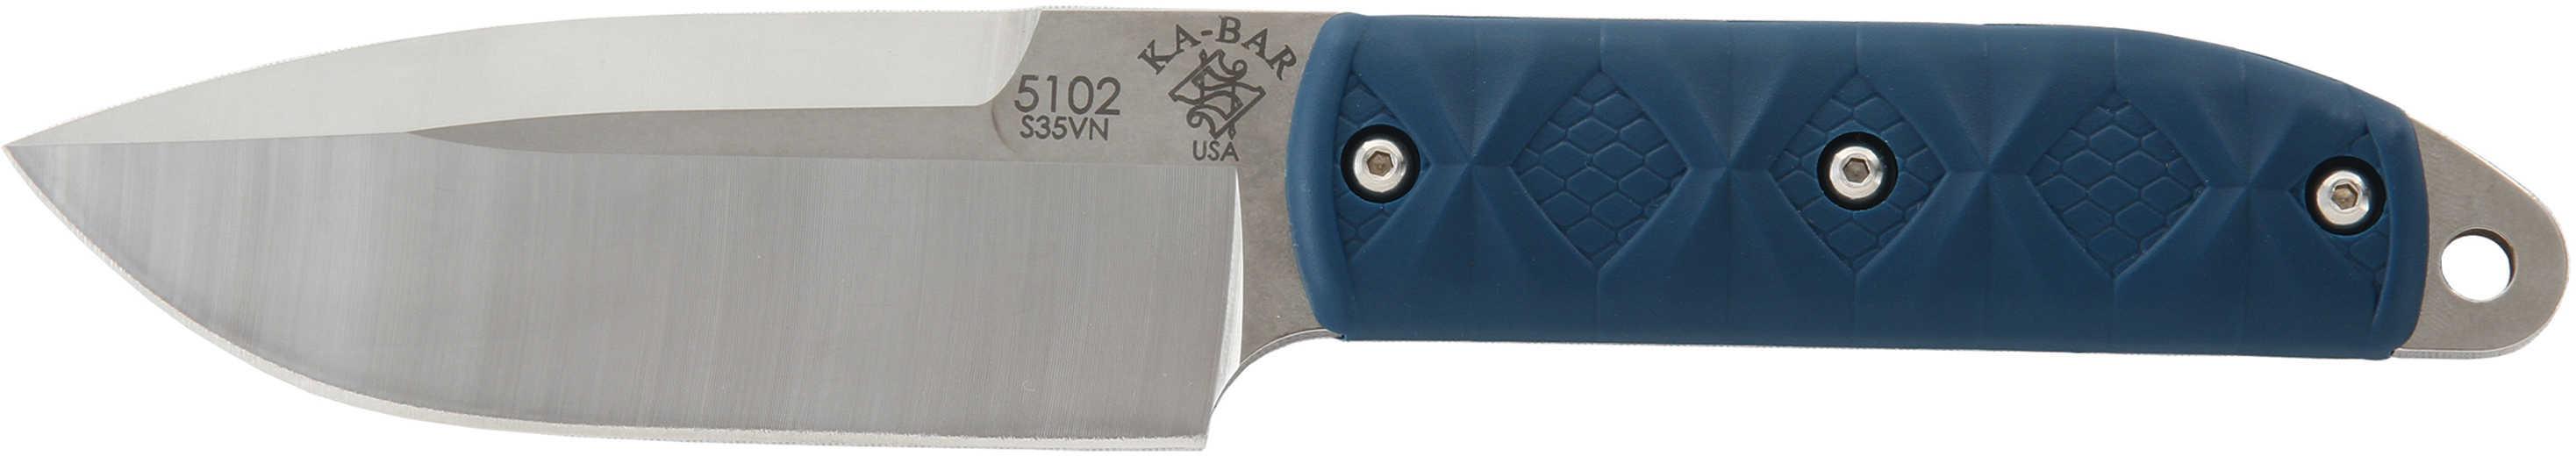 "Ka-Bar 5102 Snody Big Boss 4.56"" S35VN Stainless Steel Fixed Blade Zytel Handle Knife"